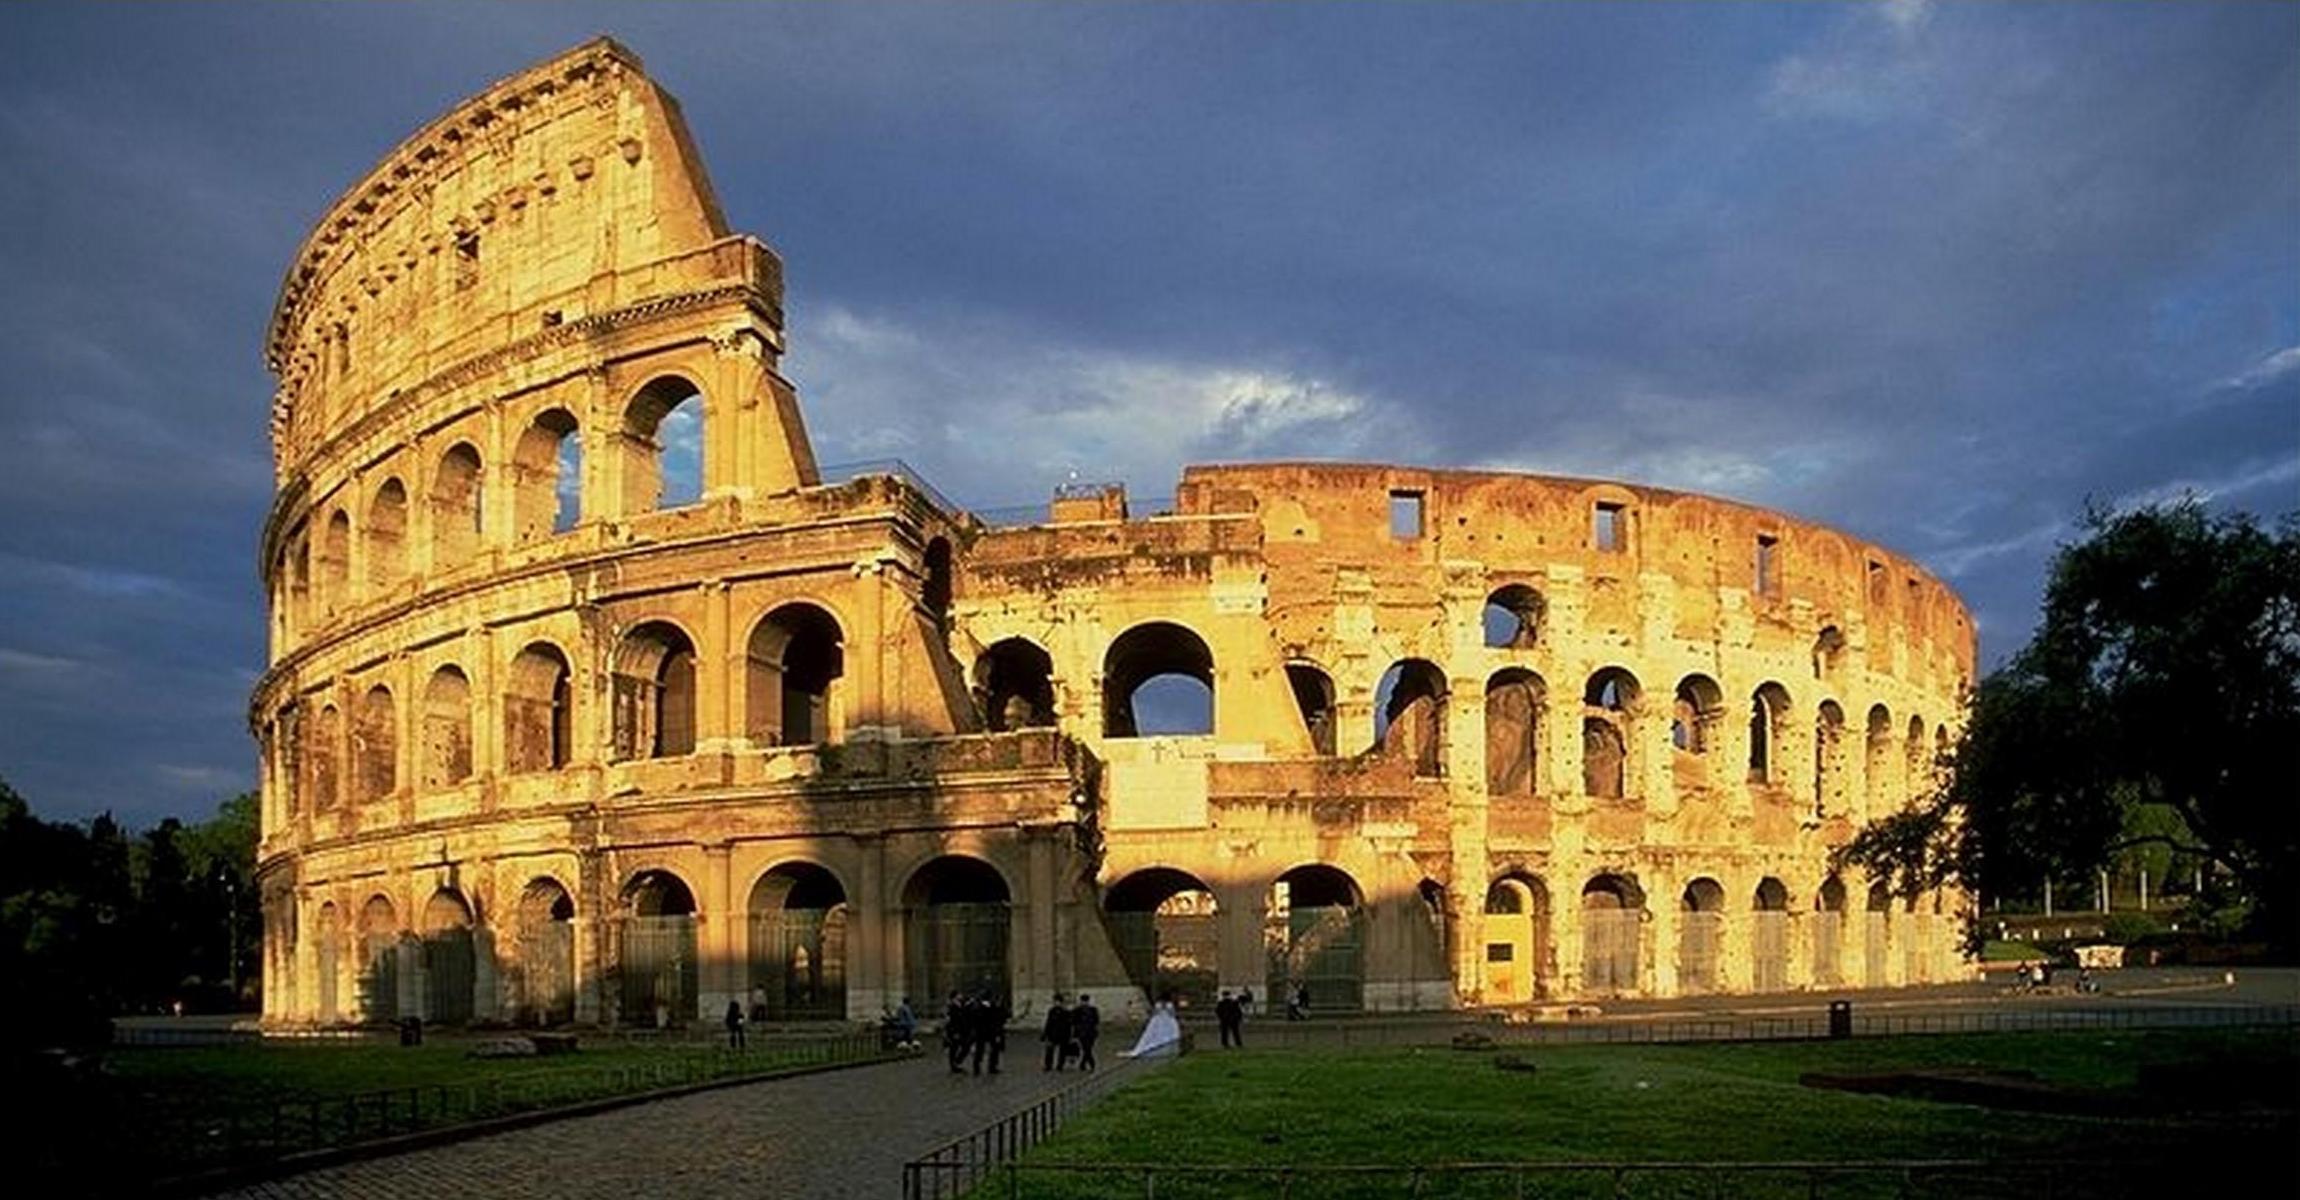 roma - photo #5